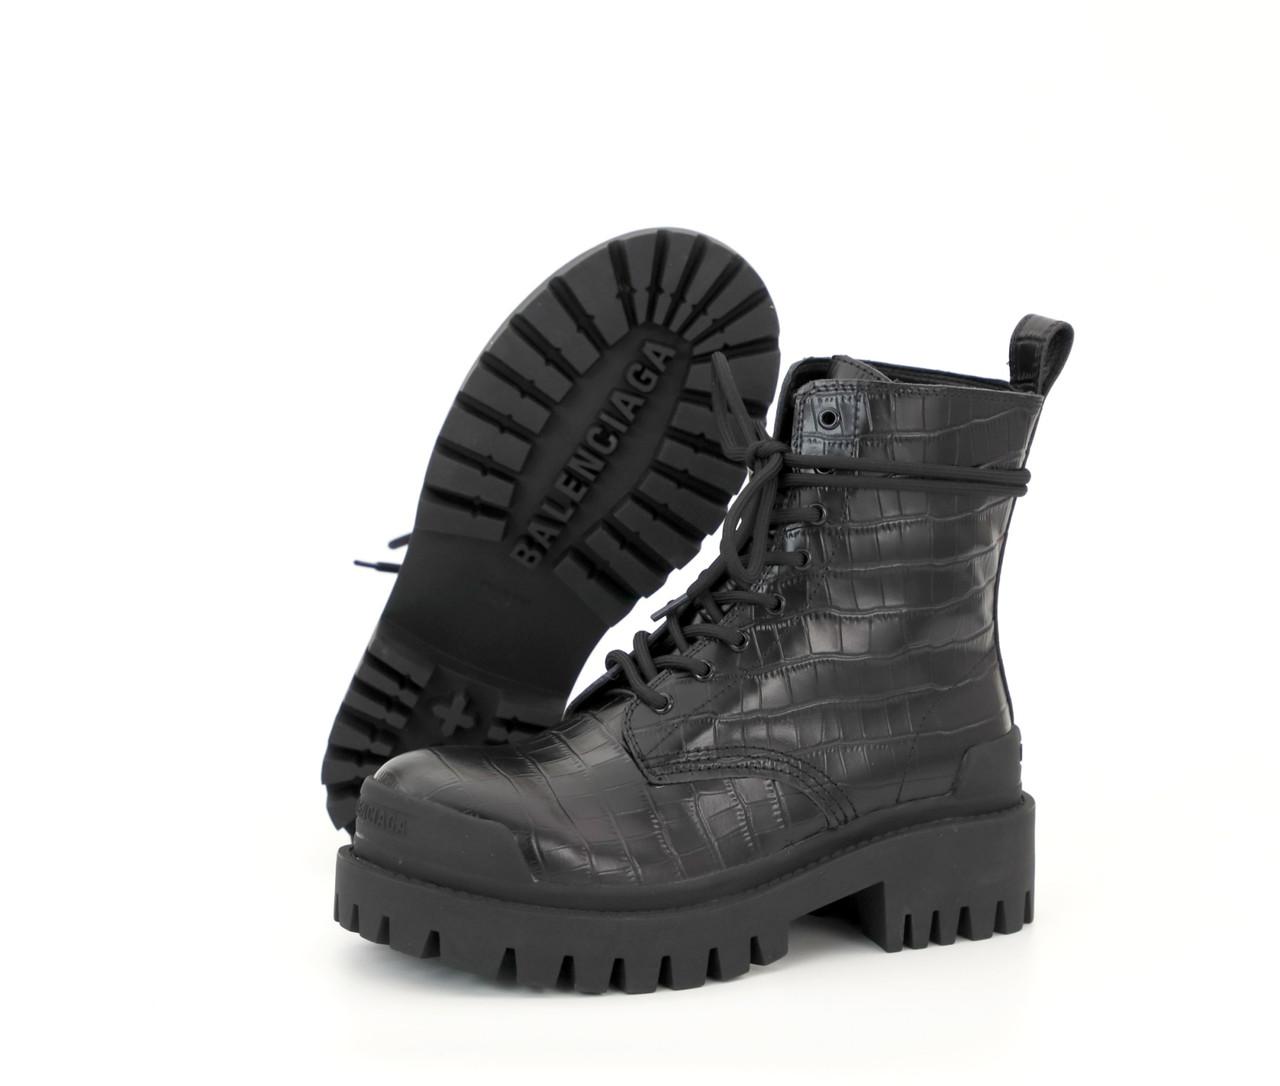 Демисезонные женские ботинки Balenciaga Strike. ТОП Реплика ААА класса.